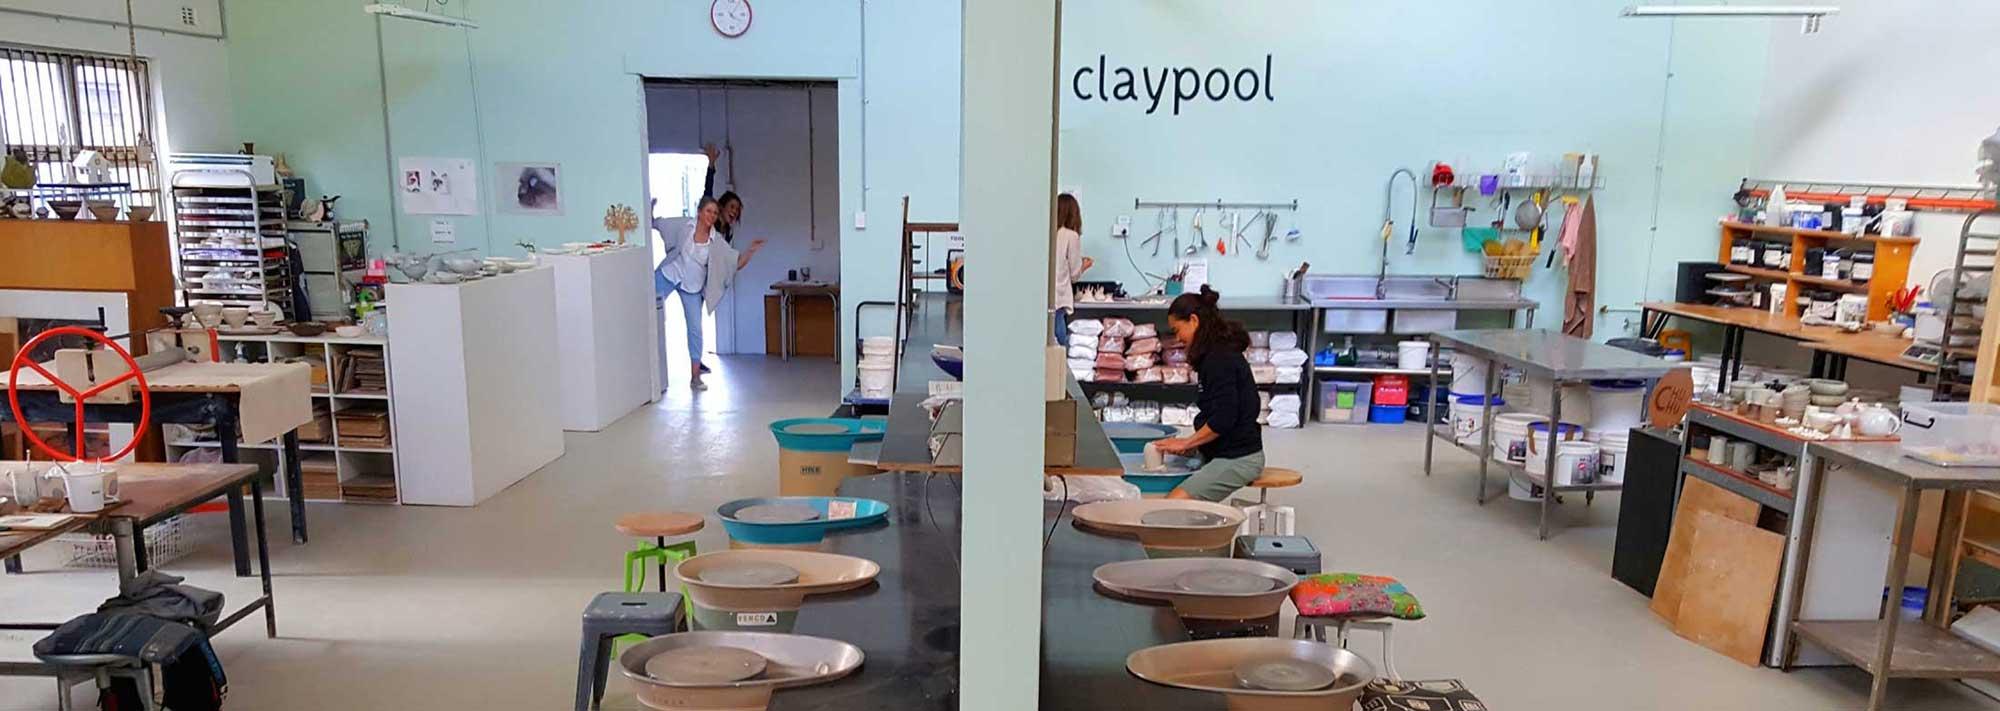 Welcome to Claypool Ceramic Studios